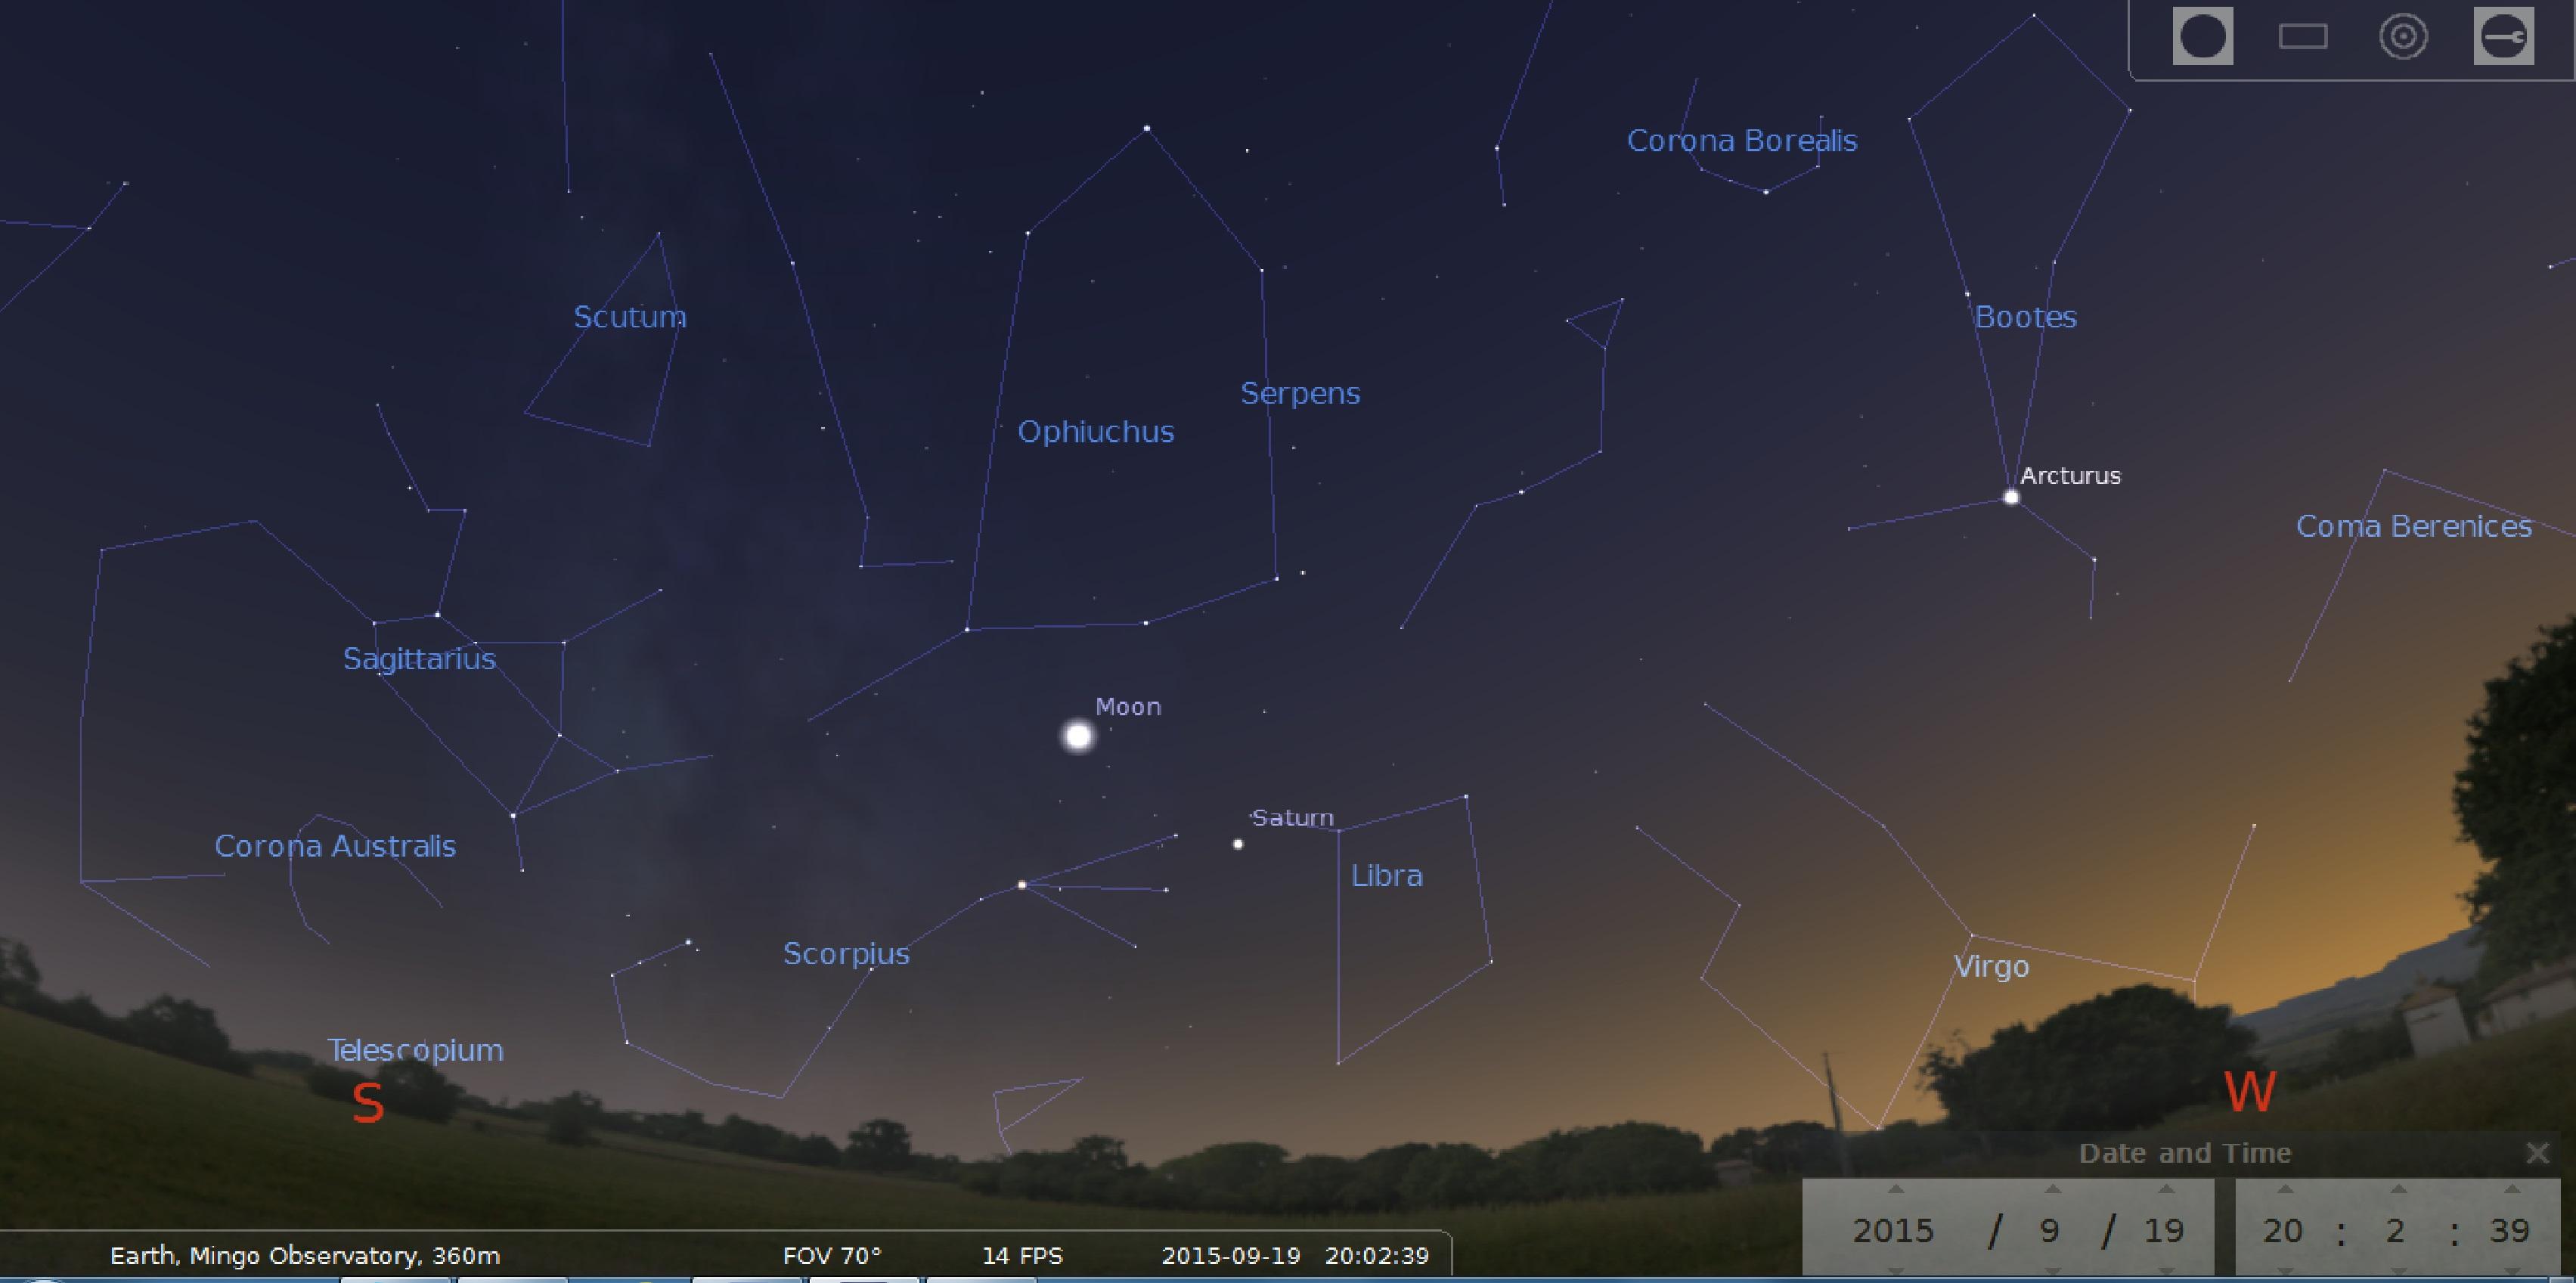 September 19, 2015, 8 PM, Southeast Horizon, Mingo Observatory, Stellarium Screen Capture